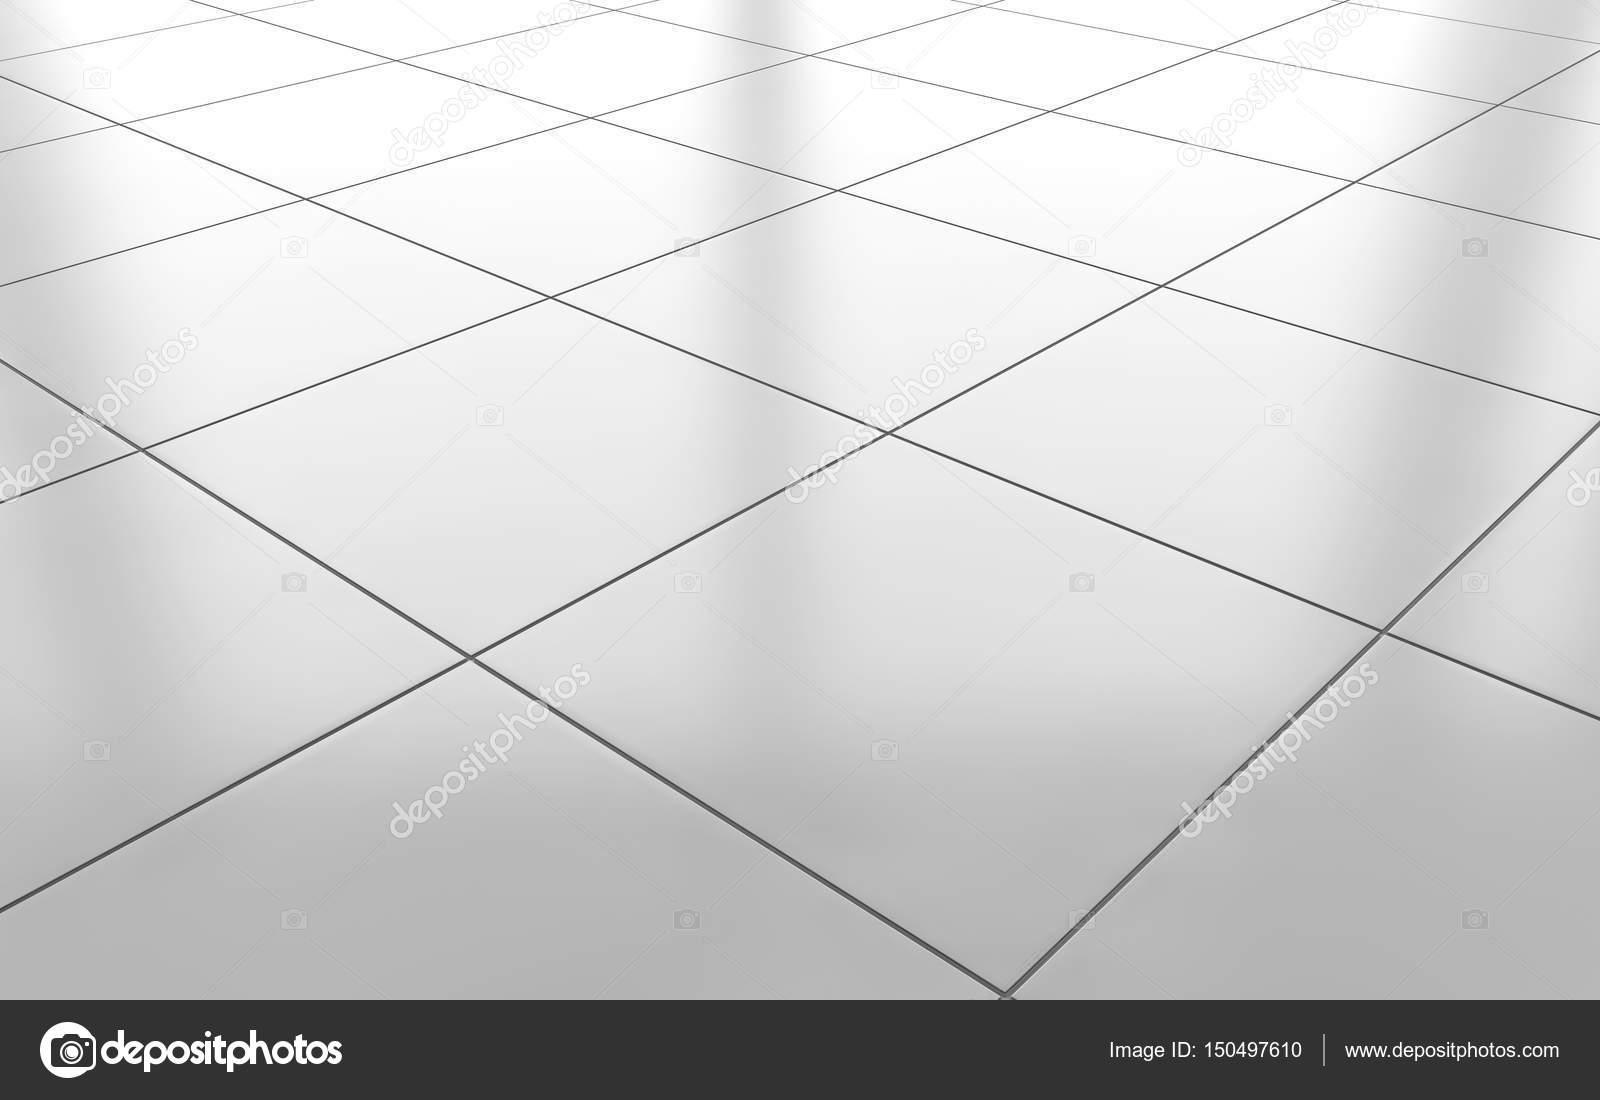 Telha Cer 226 Mica Brilhante Branco Piso Fundo Renderiza 231 227 O